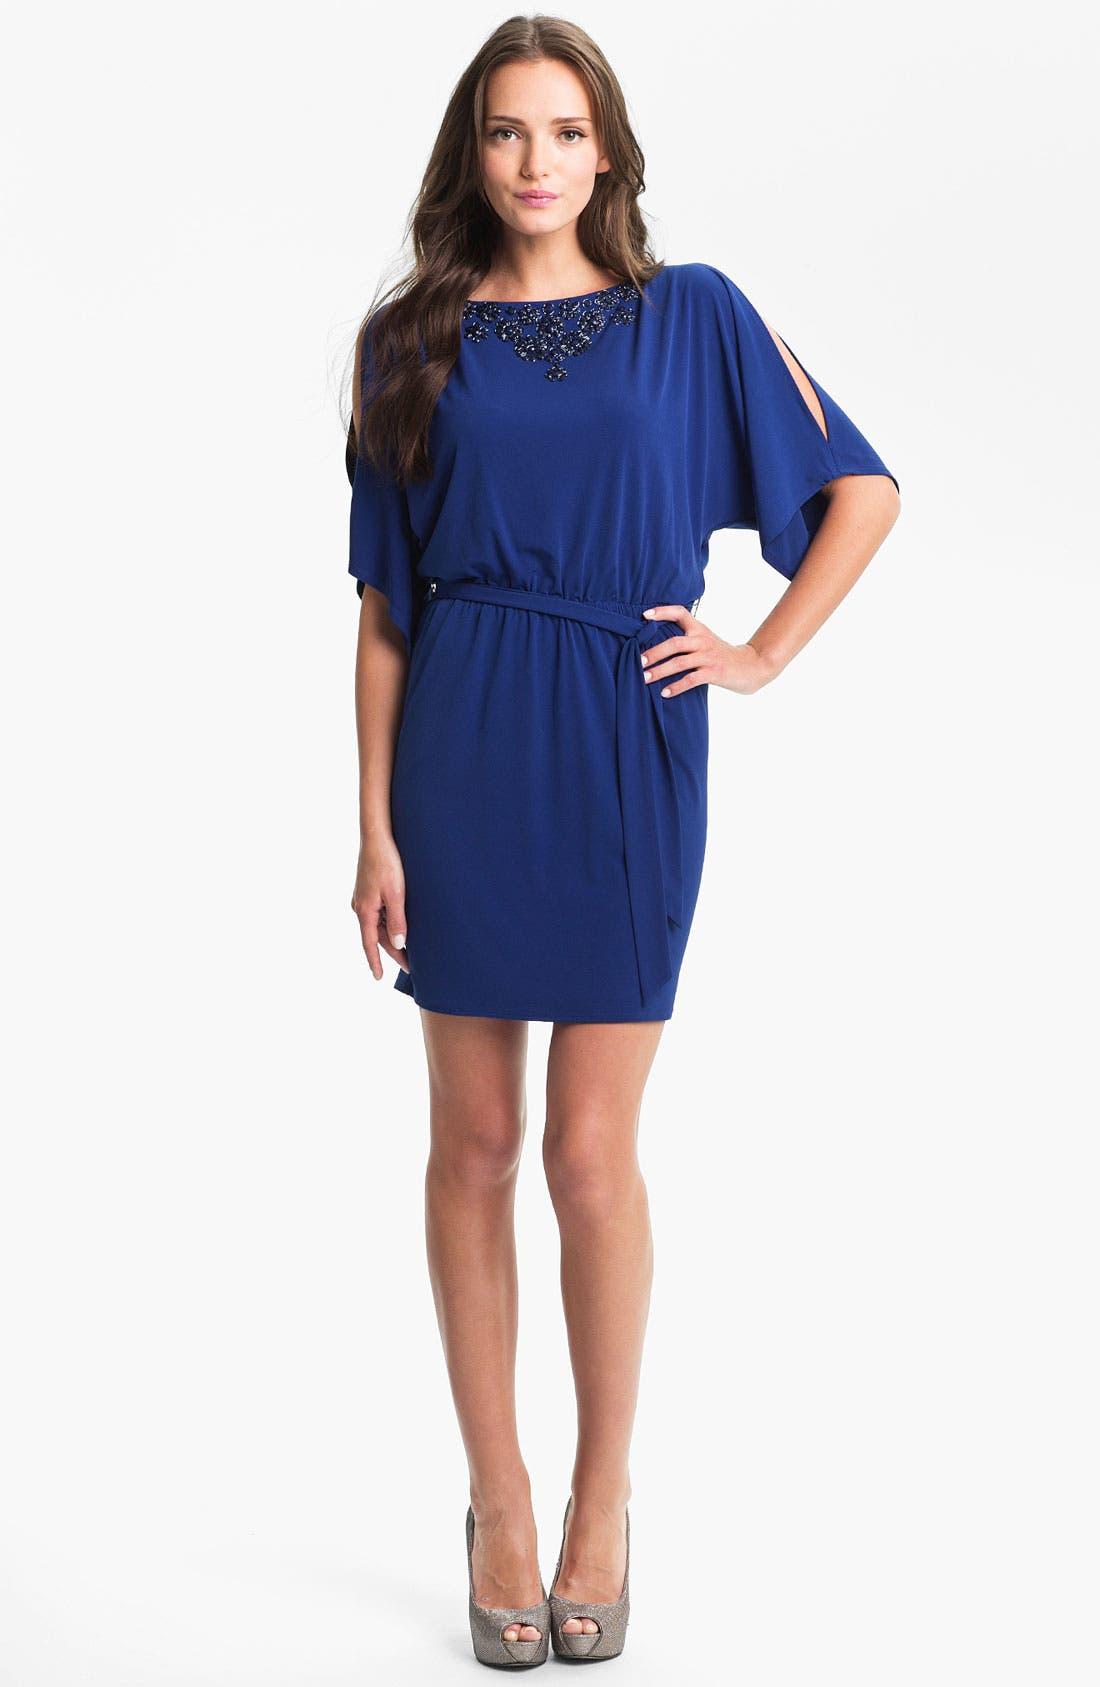 Main Image - Trina Turk 'Berenice' Beaded Blouson Dress